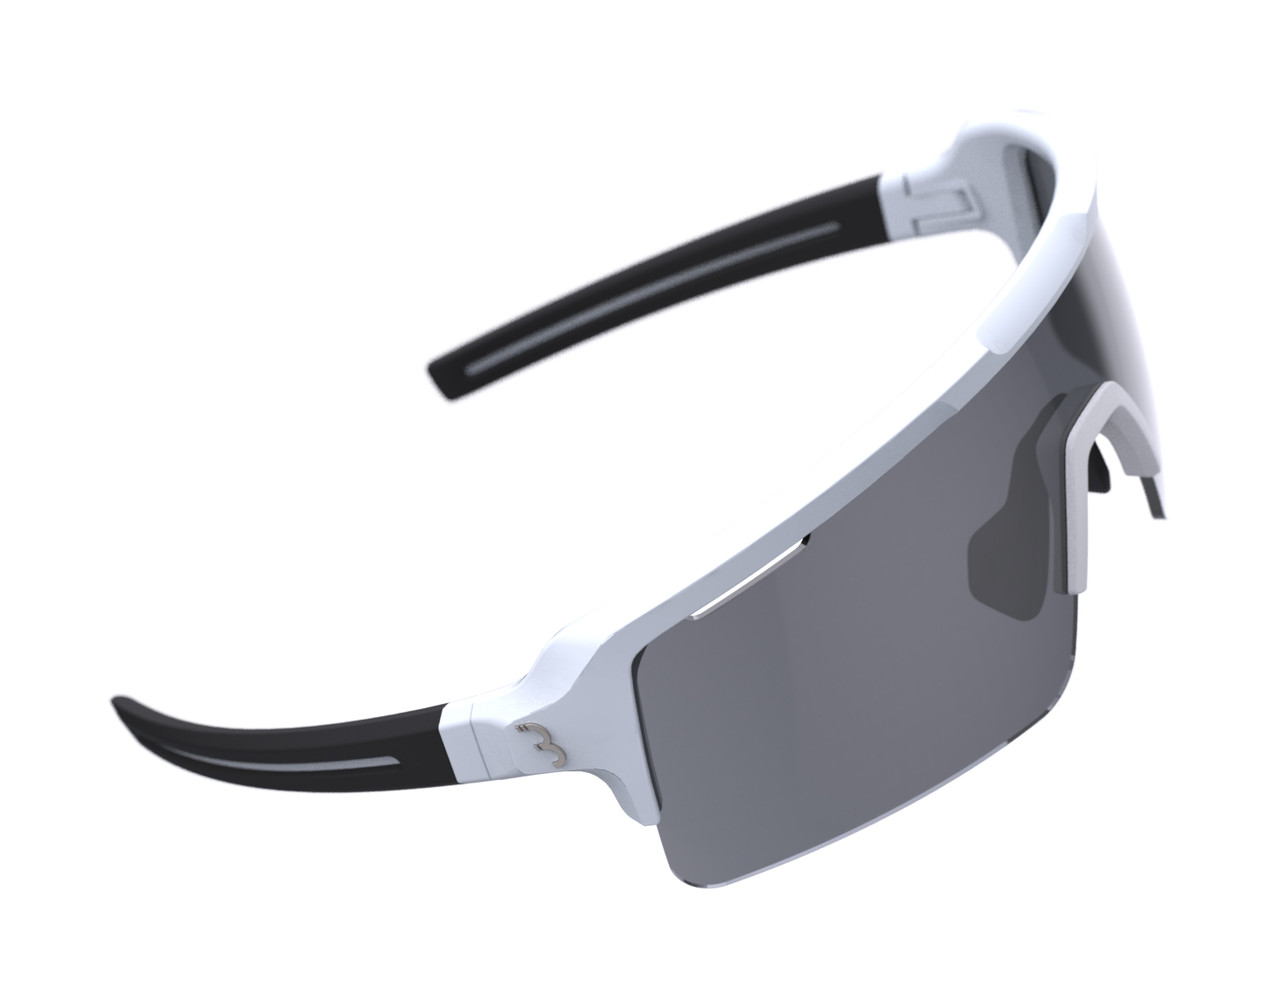 BBB Fuse Sport BSG-65 Sunglasses Matte White / Smoke Lens RRP £64.99